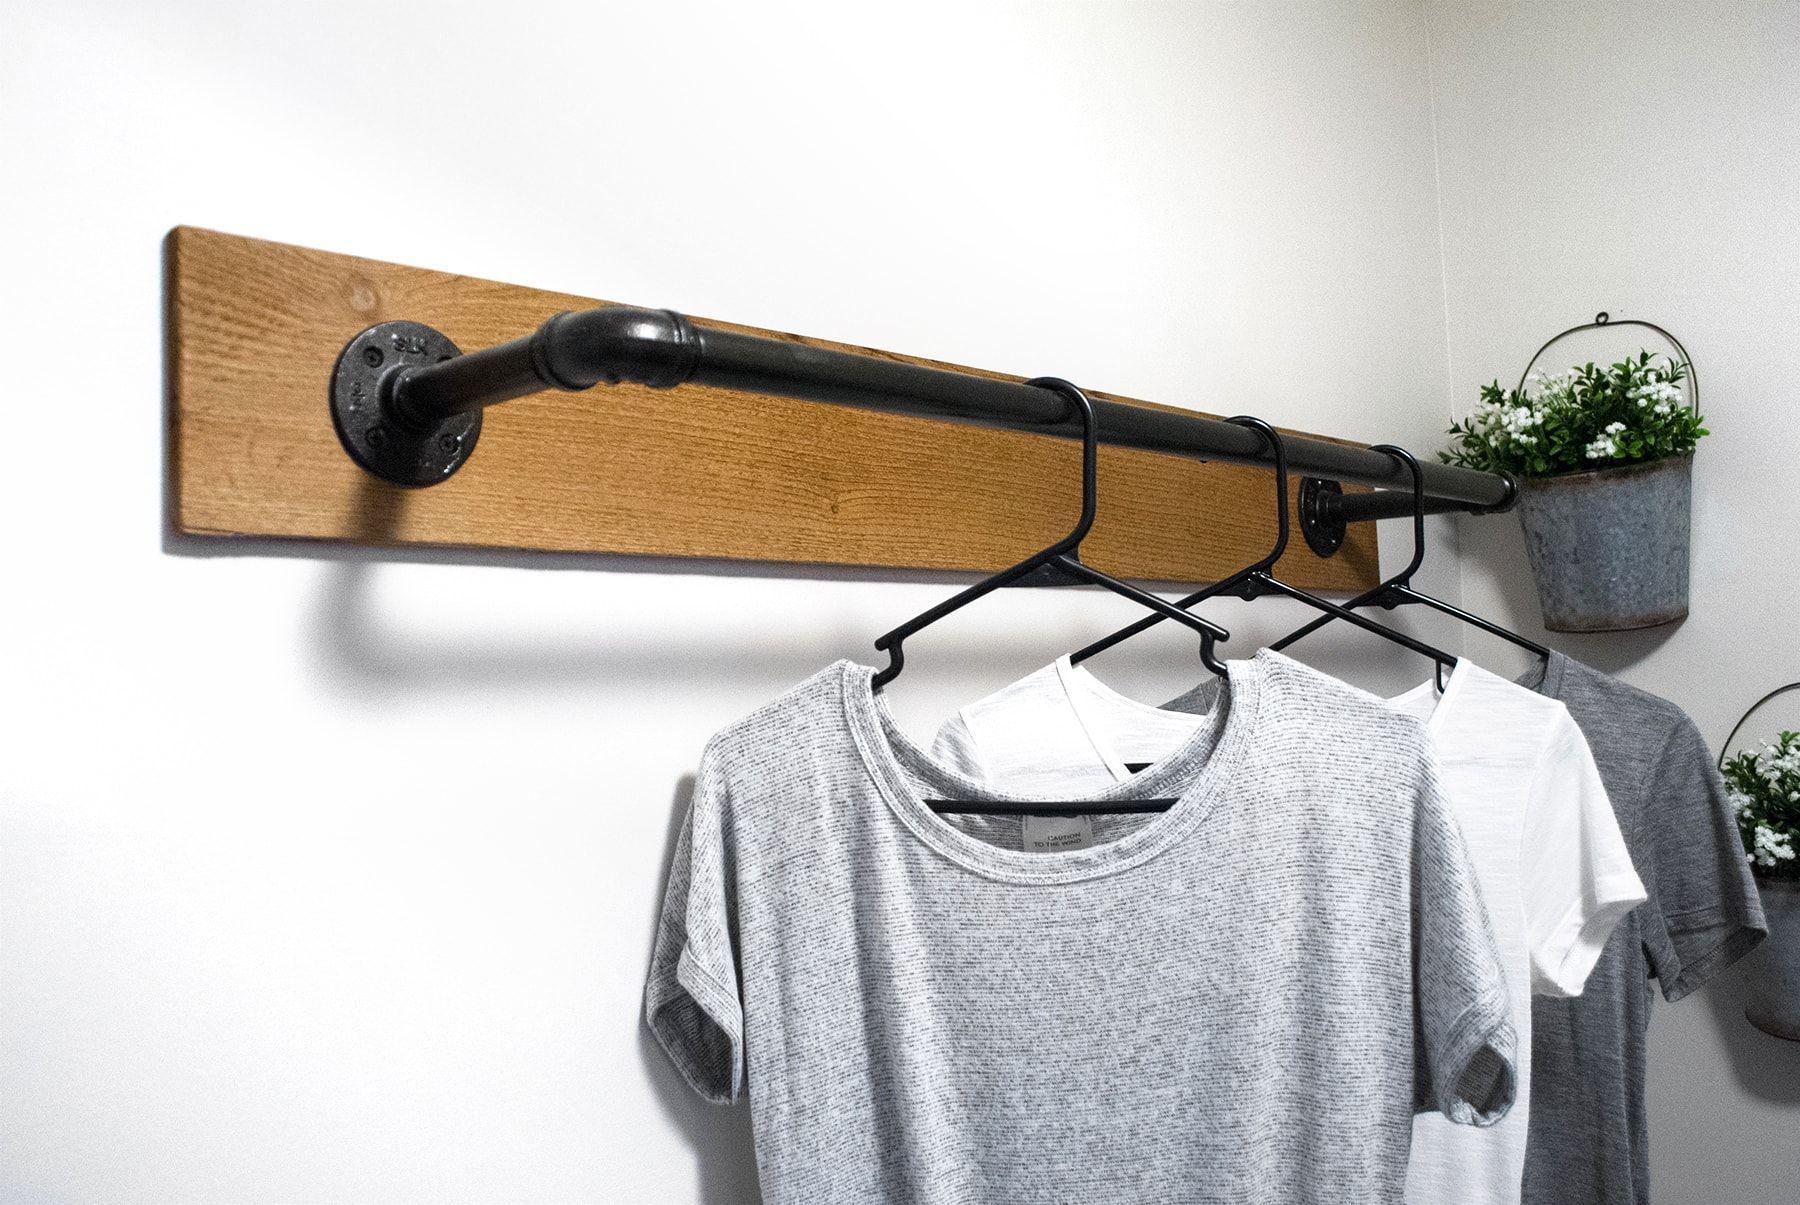 Wall Mounted Clothing Rack With Top Shelf Wall Mounted Clothing Rack Wall Clothing Rack Wall Mounted Drying Rack